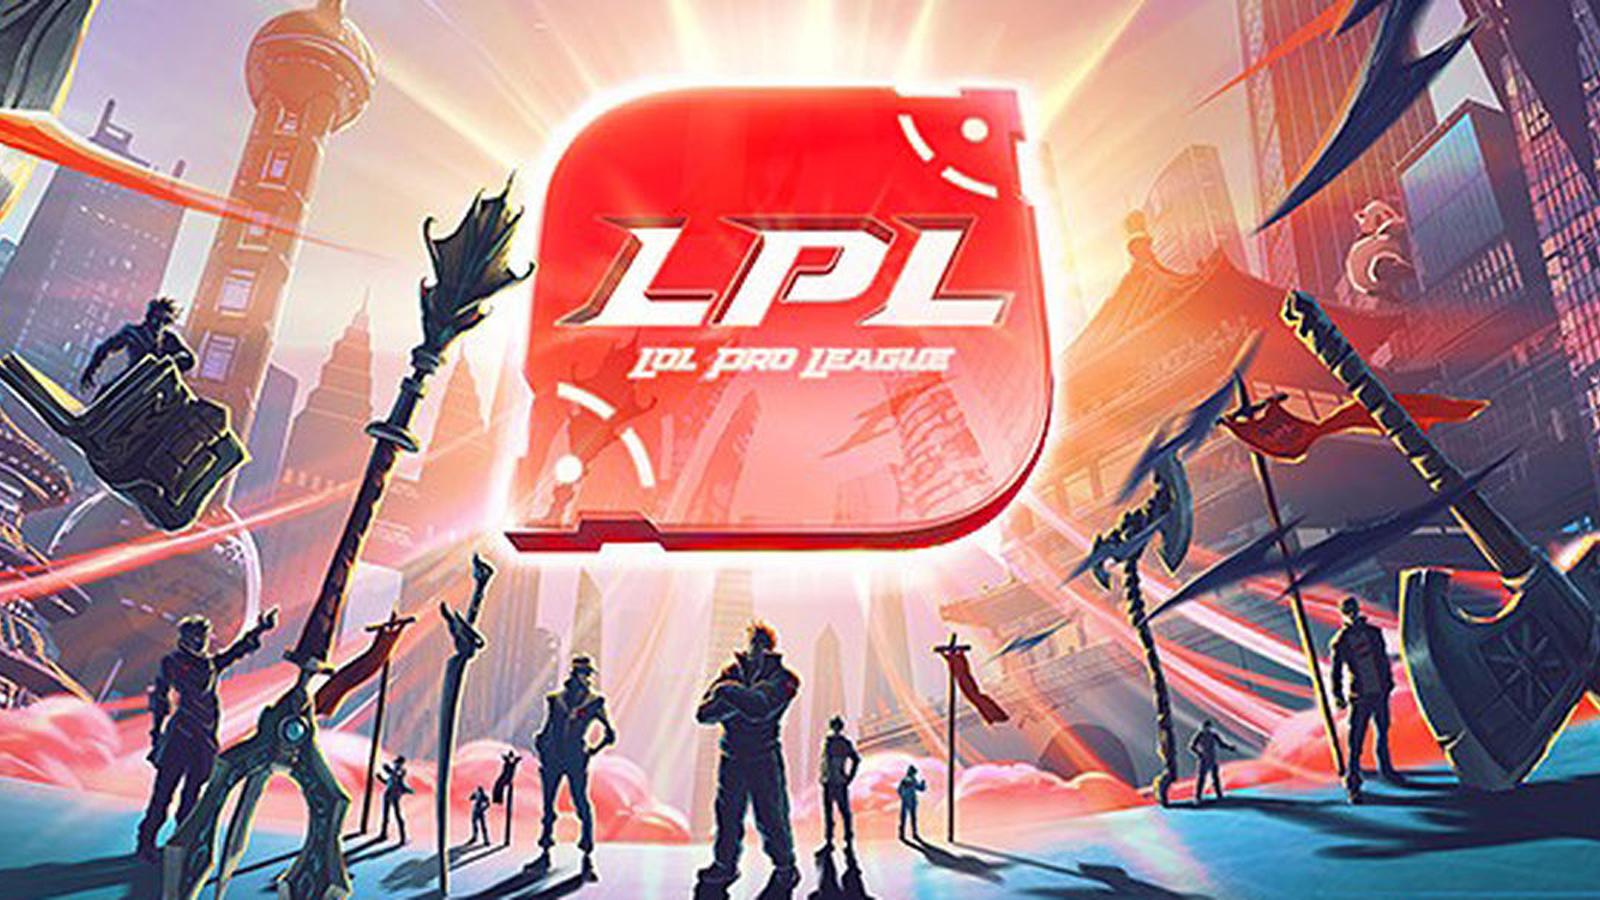 Imagen promocional LPL